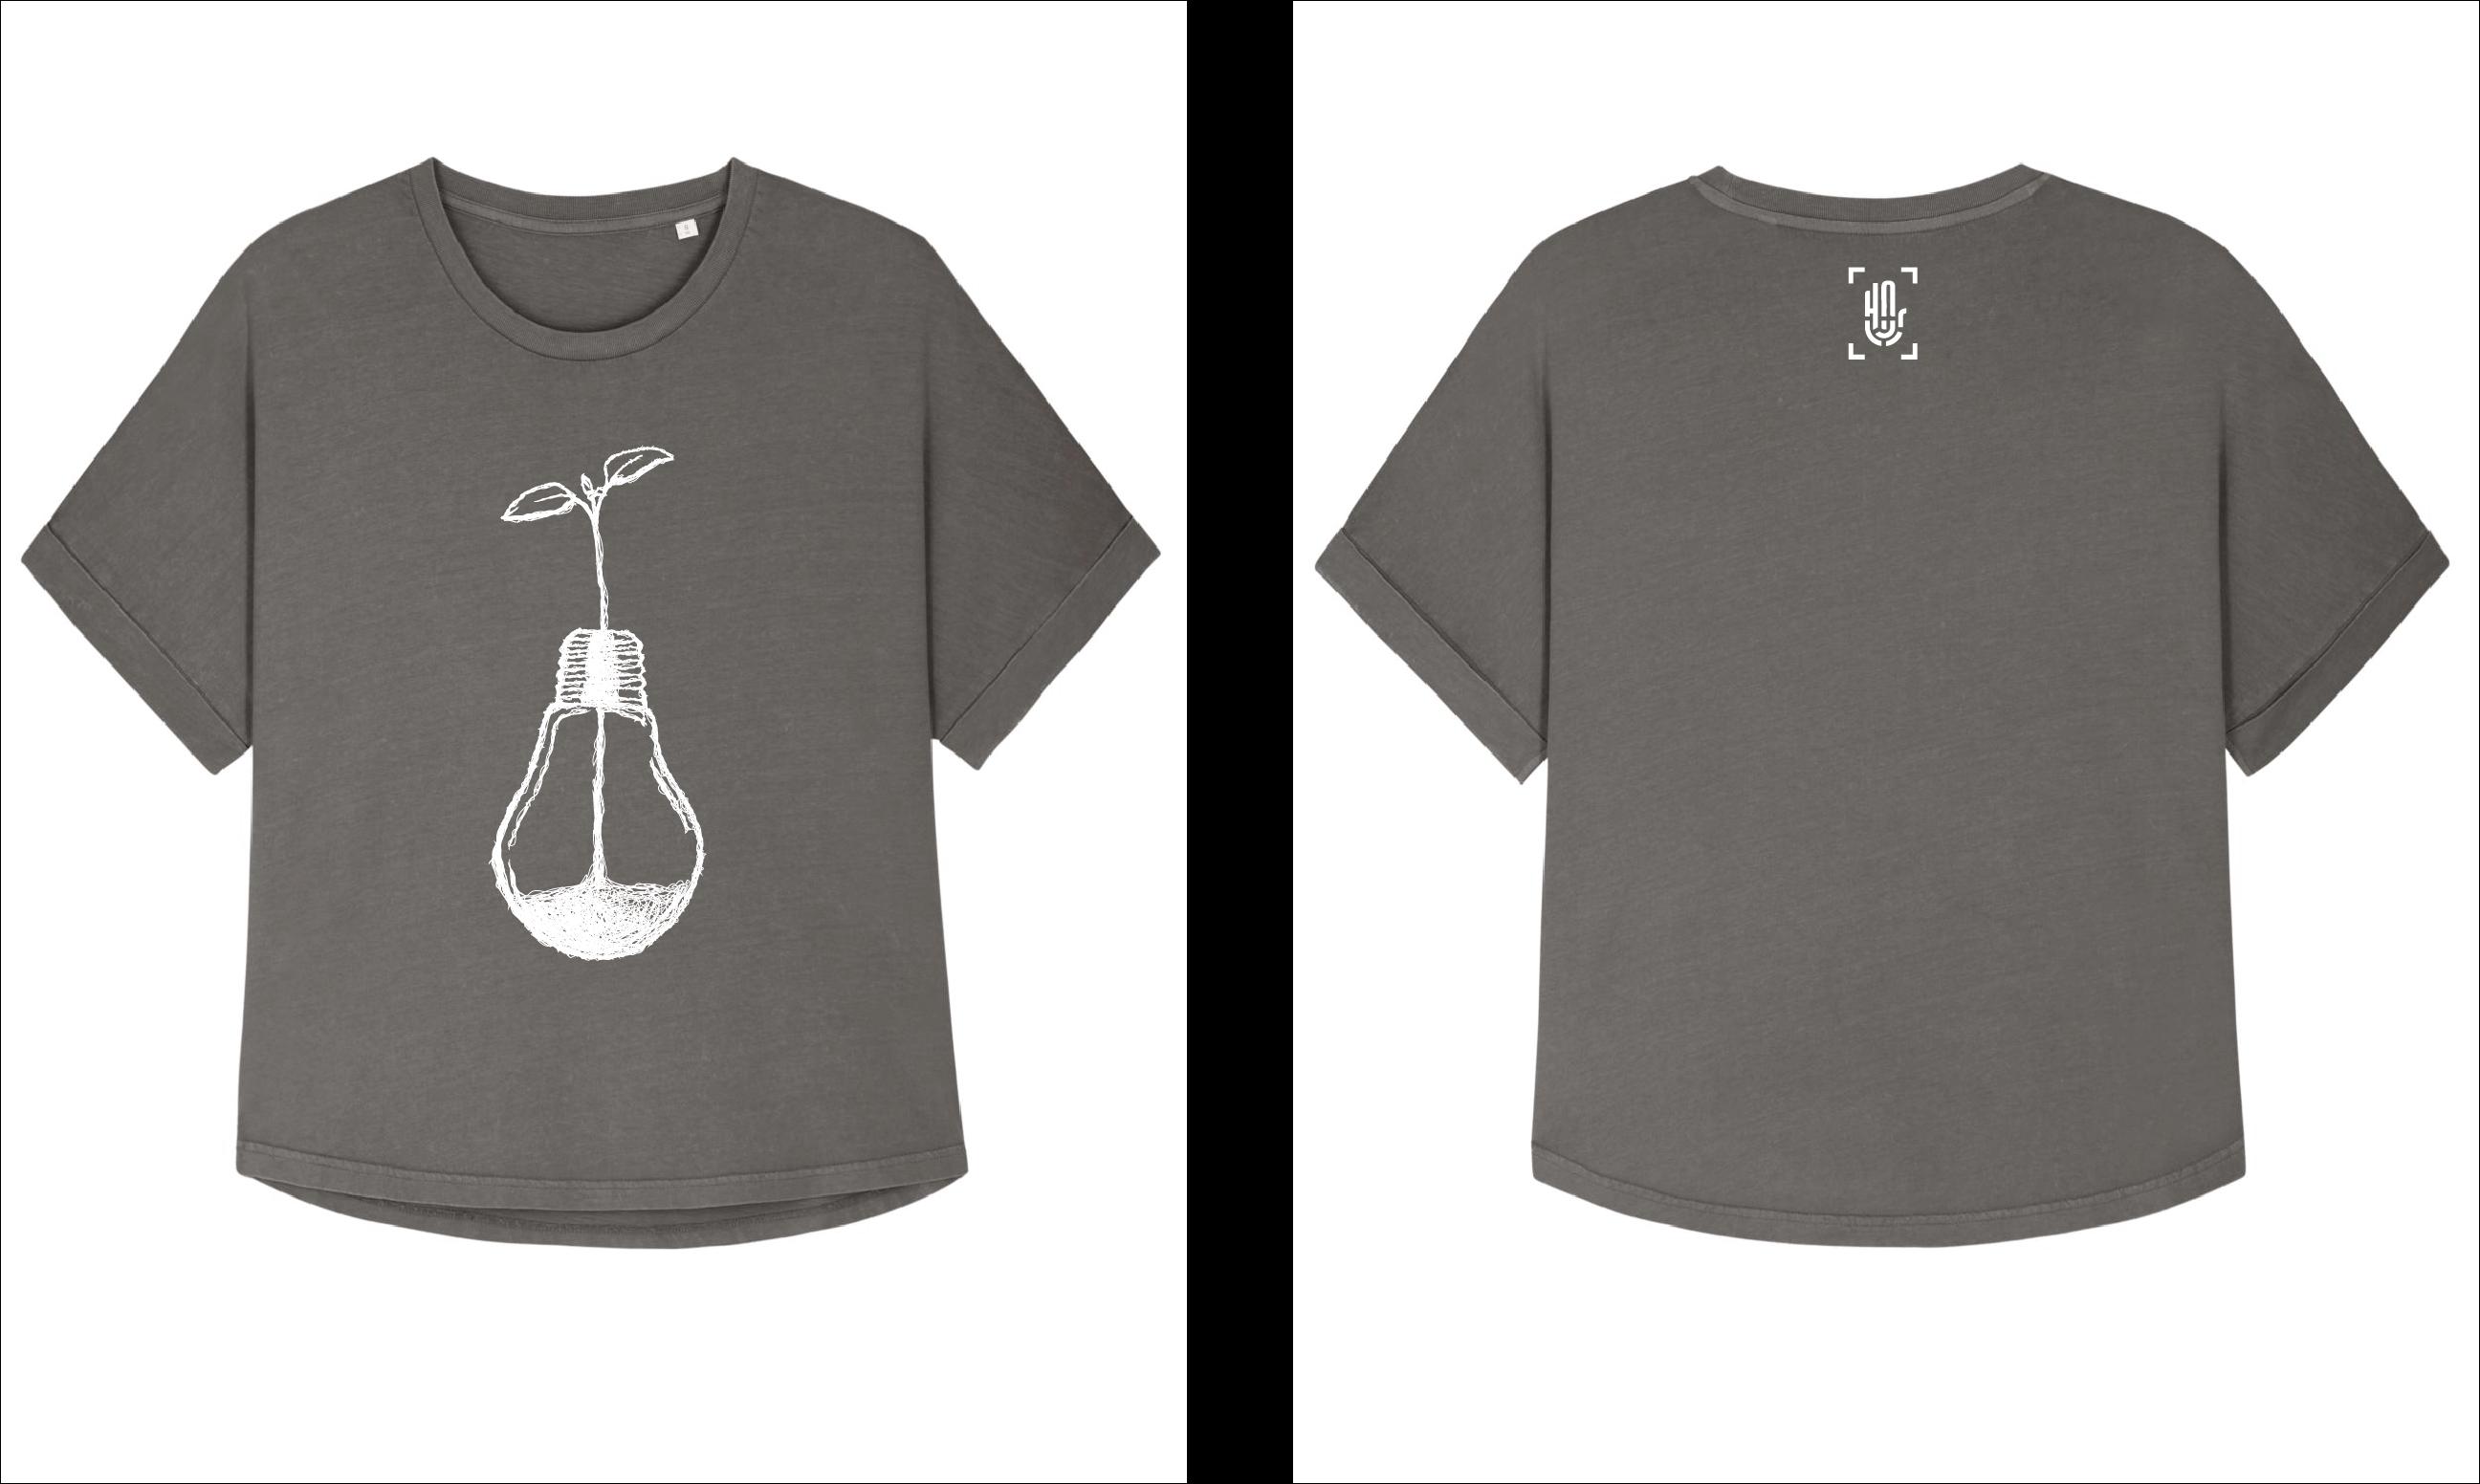 Camiseta Collider Vintage HNR004-Dyed Mid Anthracite